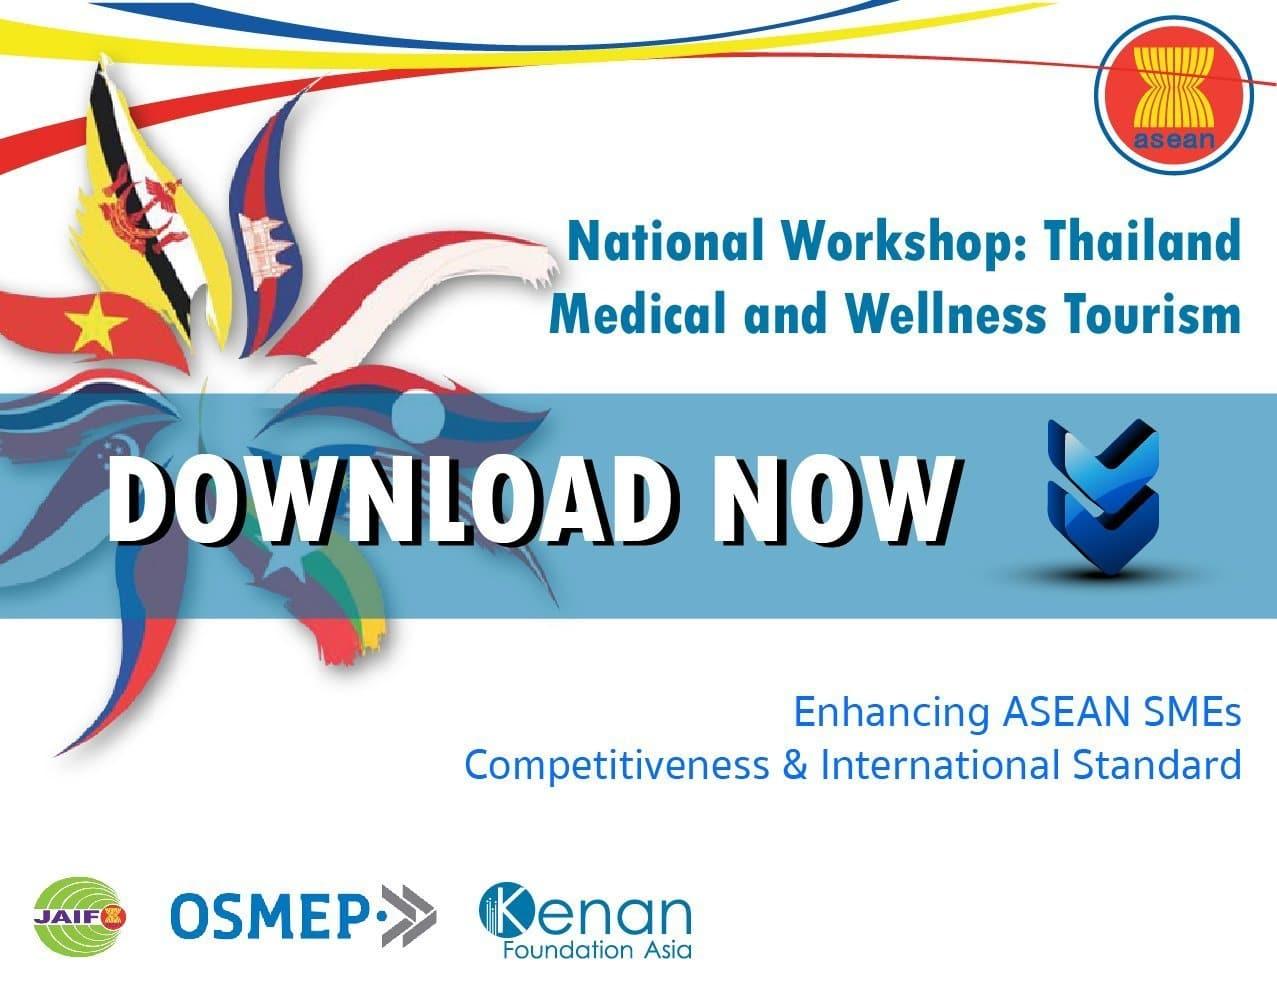 Enhancing ASEAN SMEs Competitiveness & International Standard 1